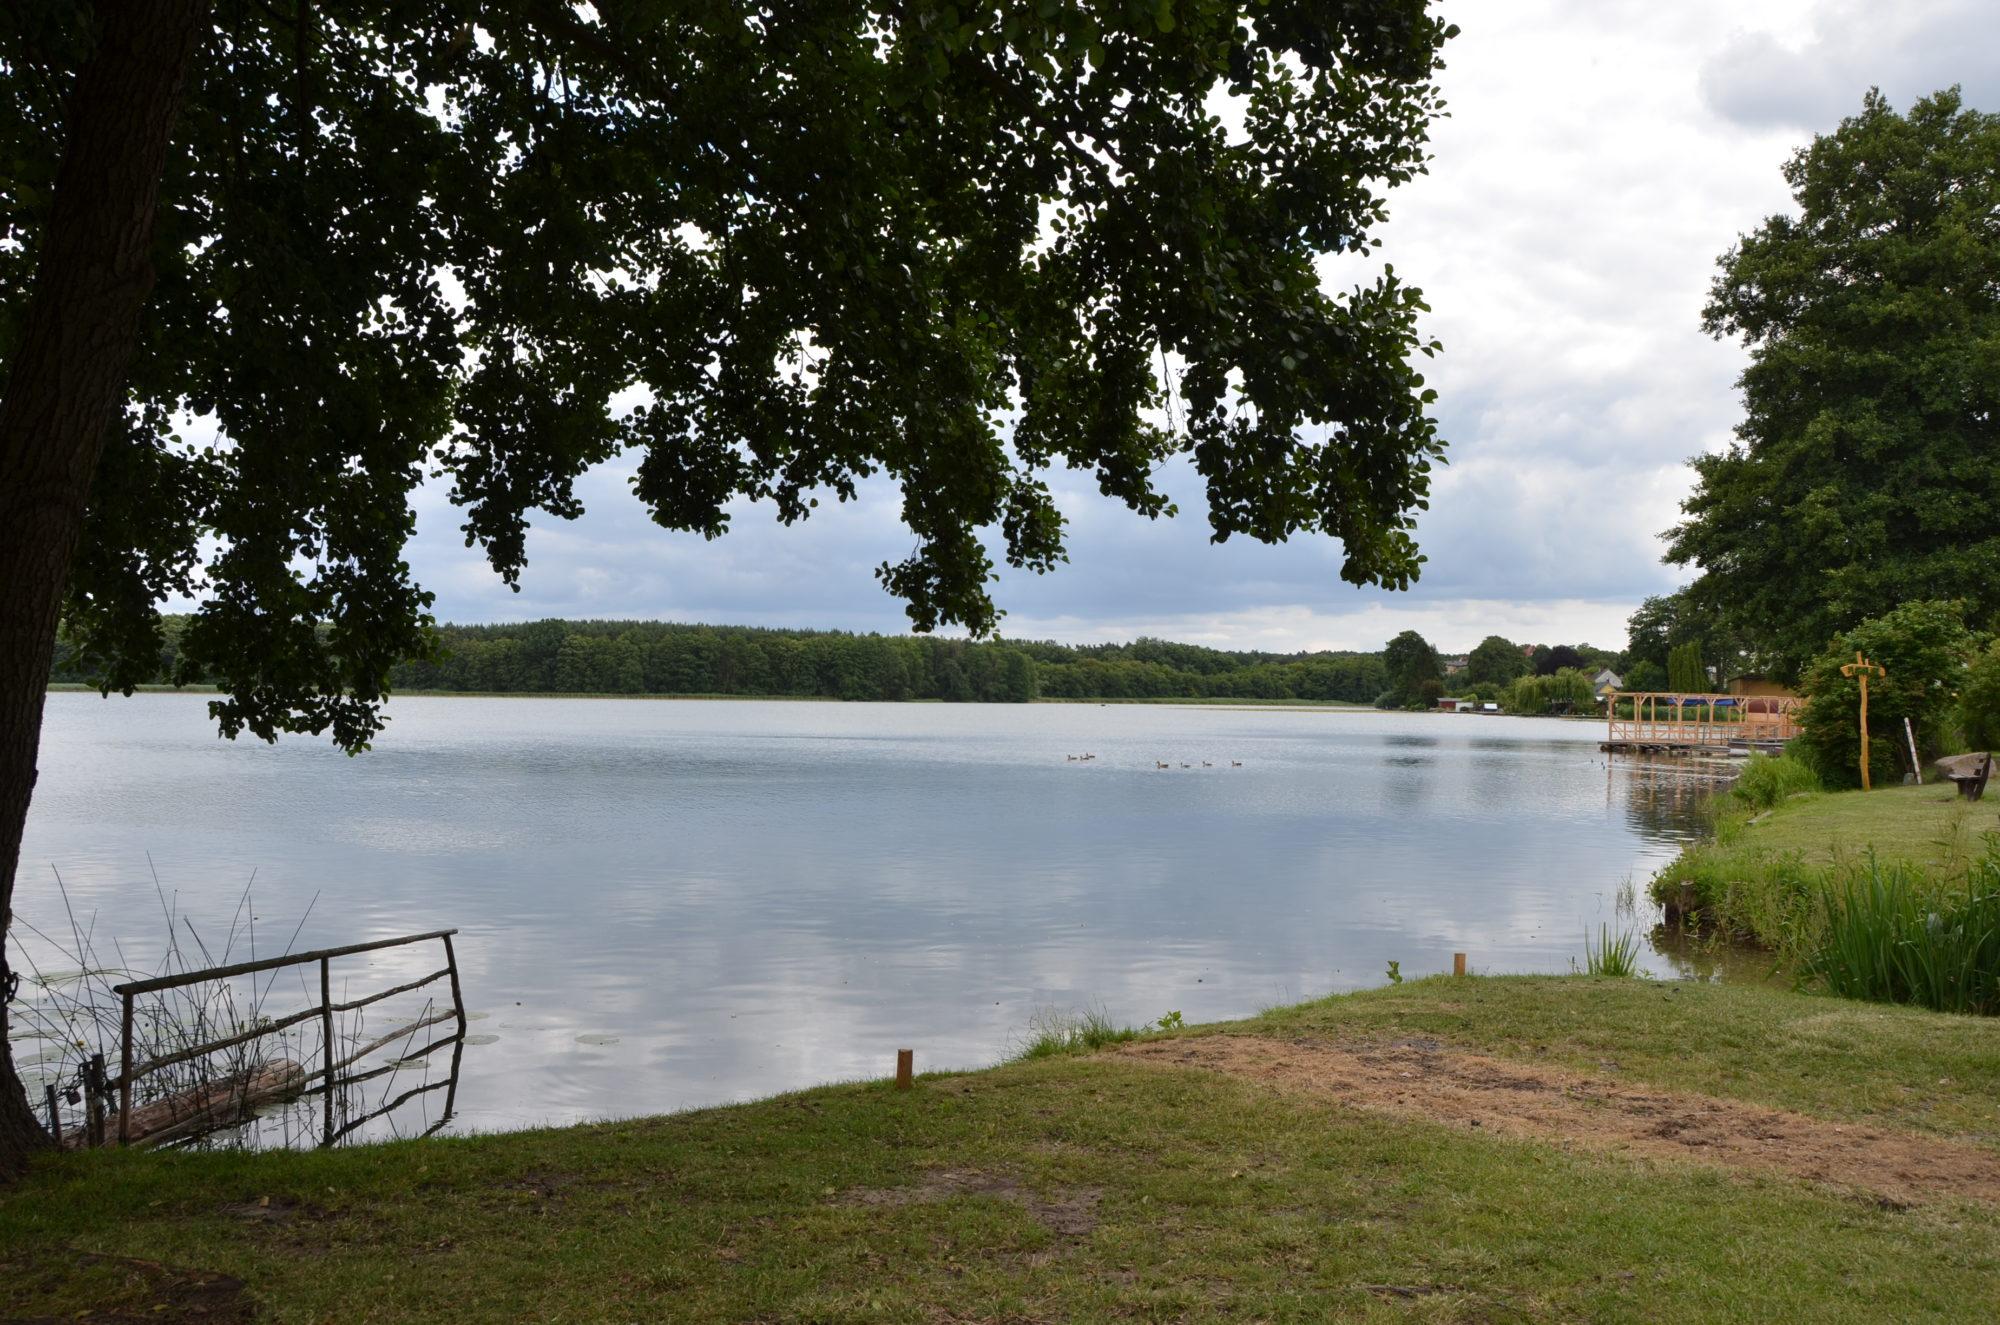 Blick auf den Pfuhl See.